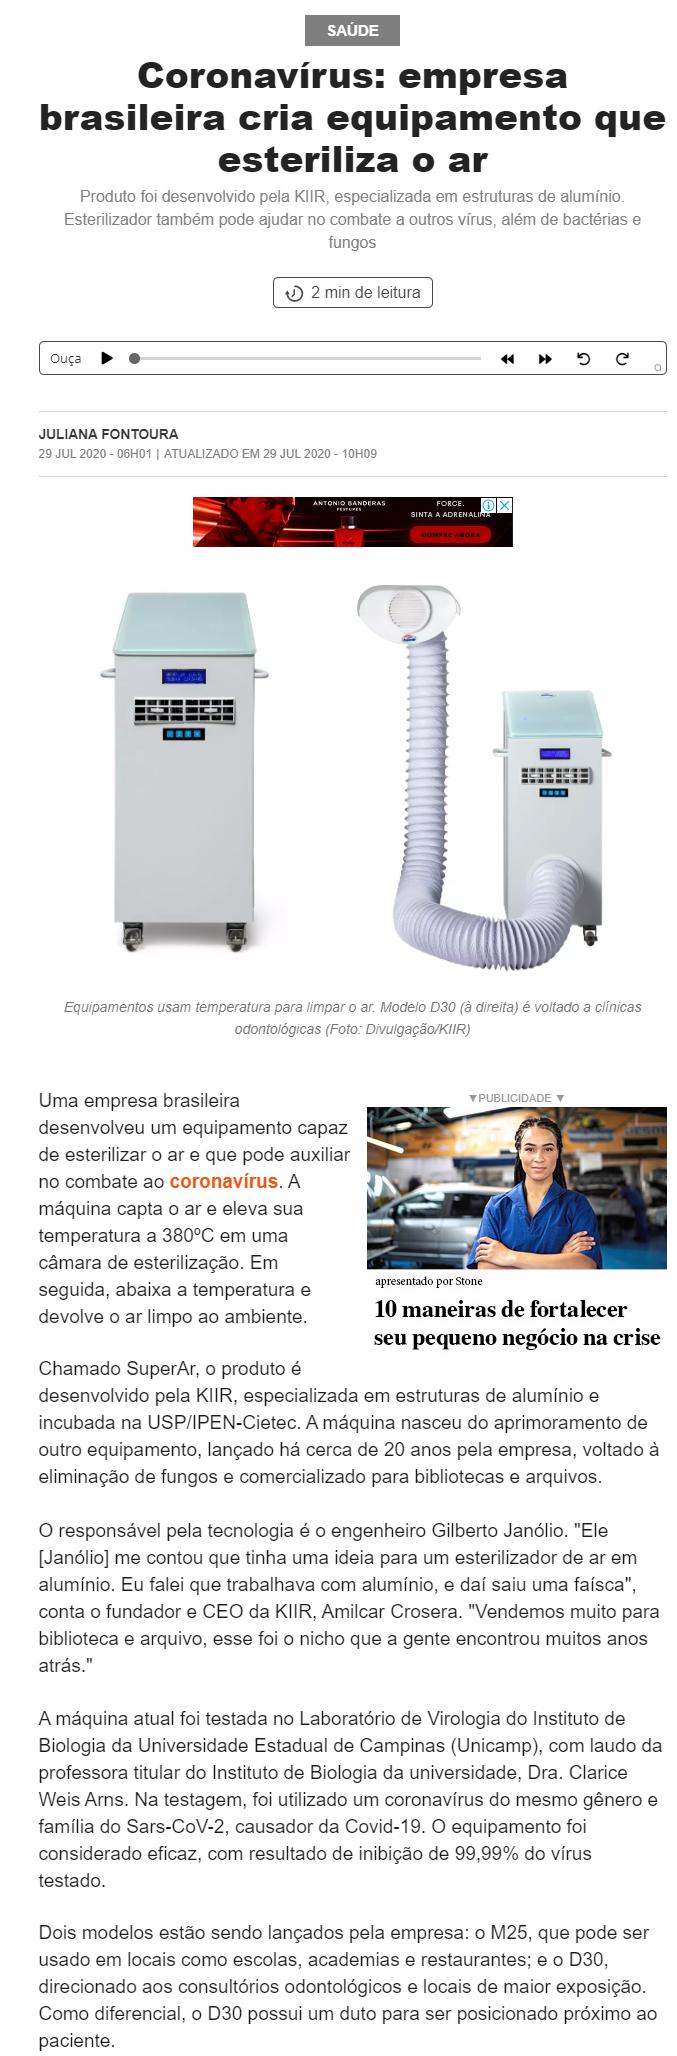 Coronavírus: empresa brasileira cria equipamento que esteriliza o ar - Pequenas Empresas Grandes Negócios